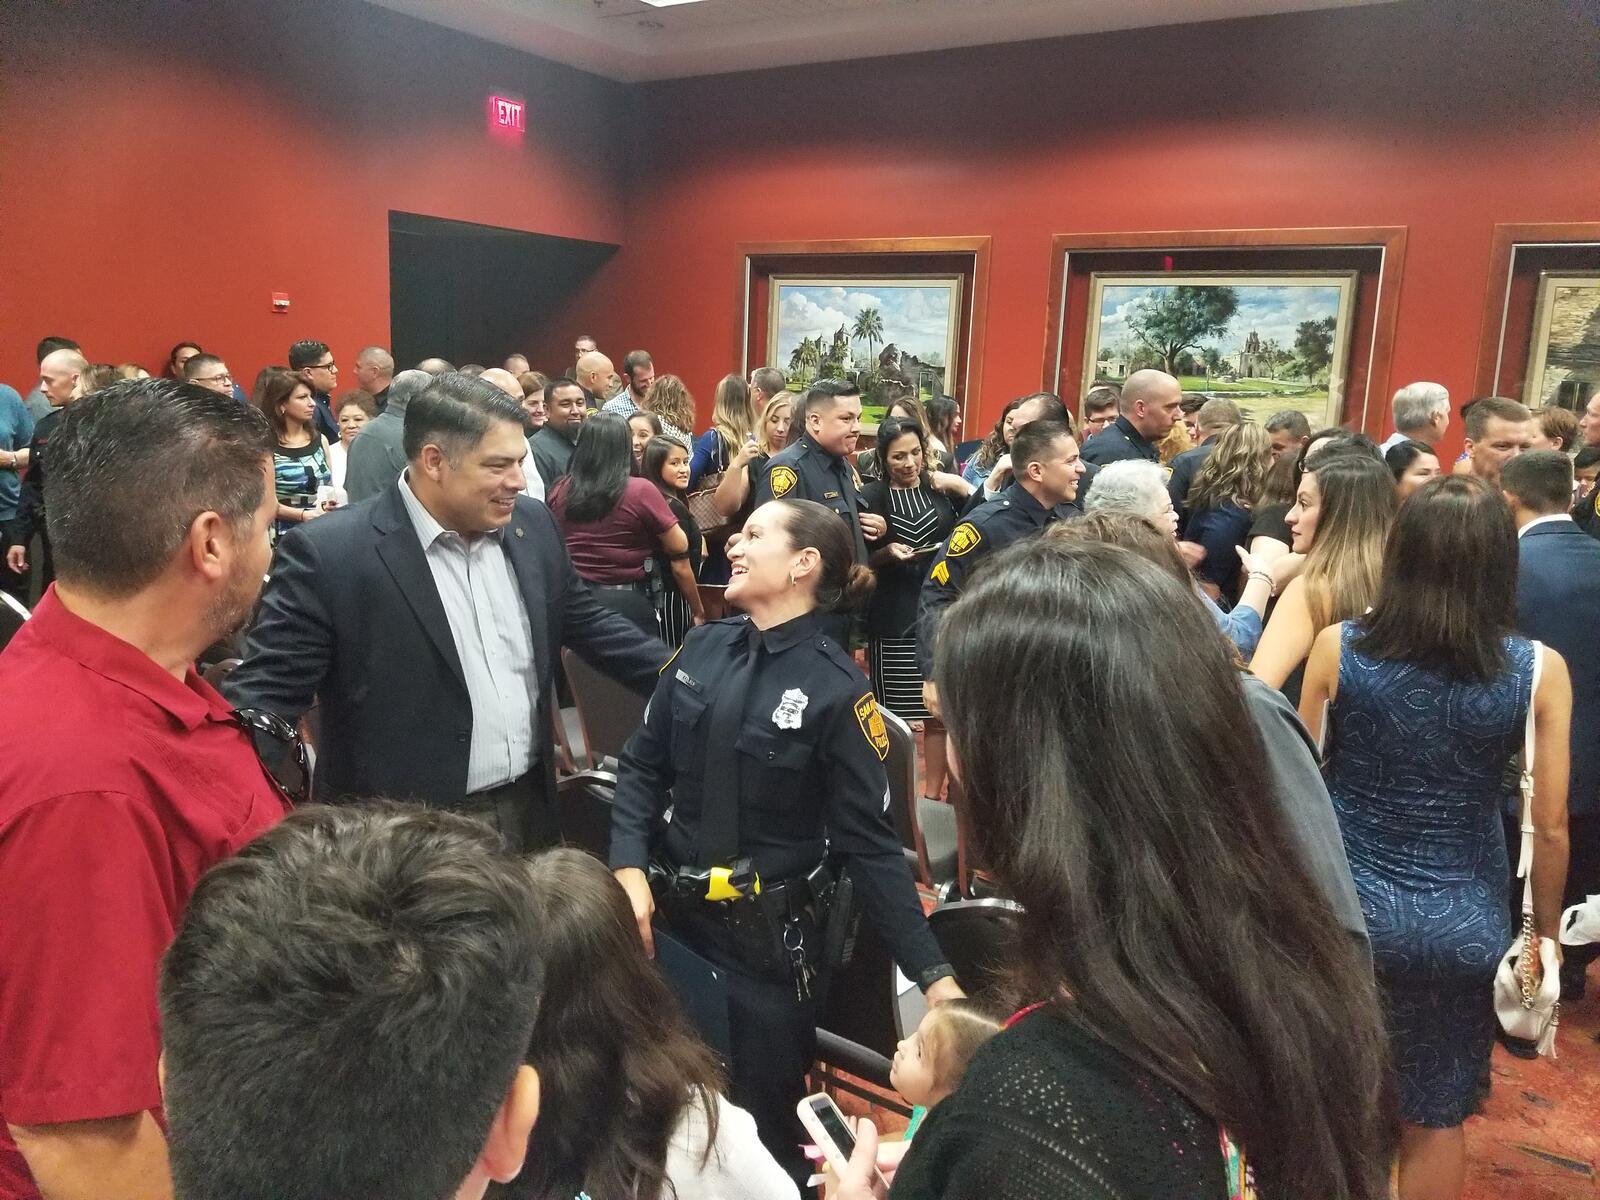 Promotion!! (San Antonio Police Department) &mdash